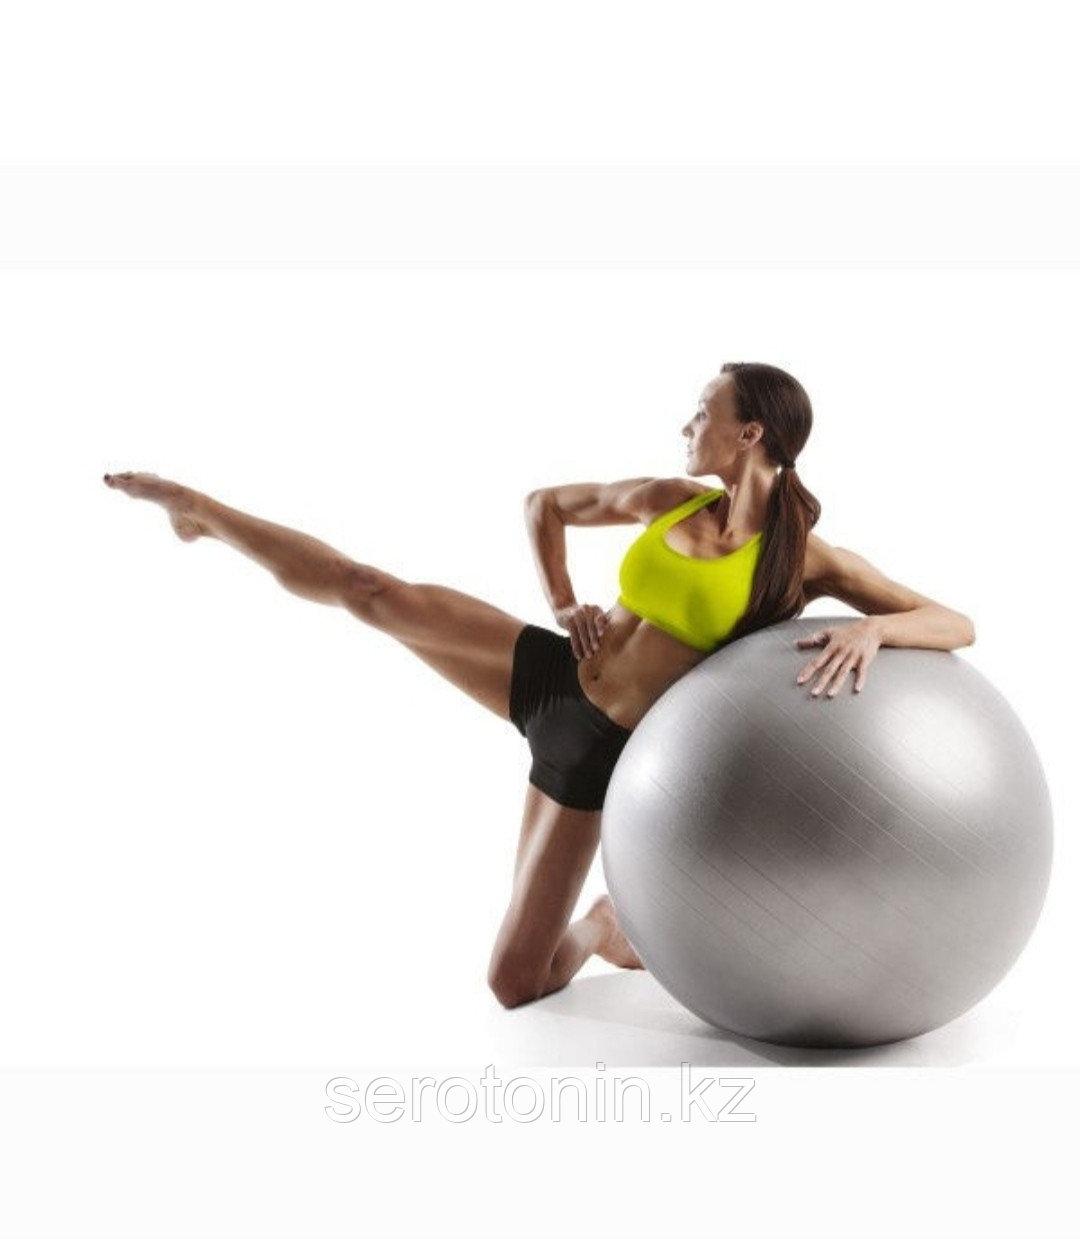 Мяч гимнастический (Фитбол) 85 см - фото 4